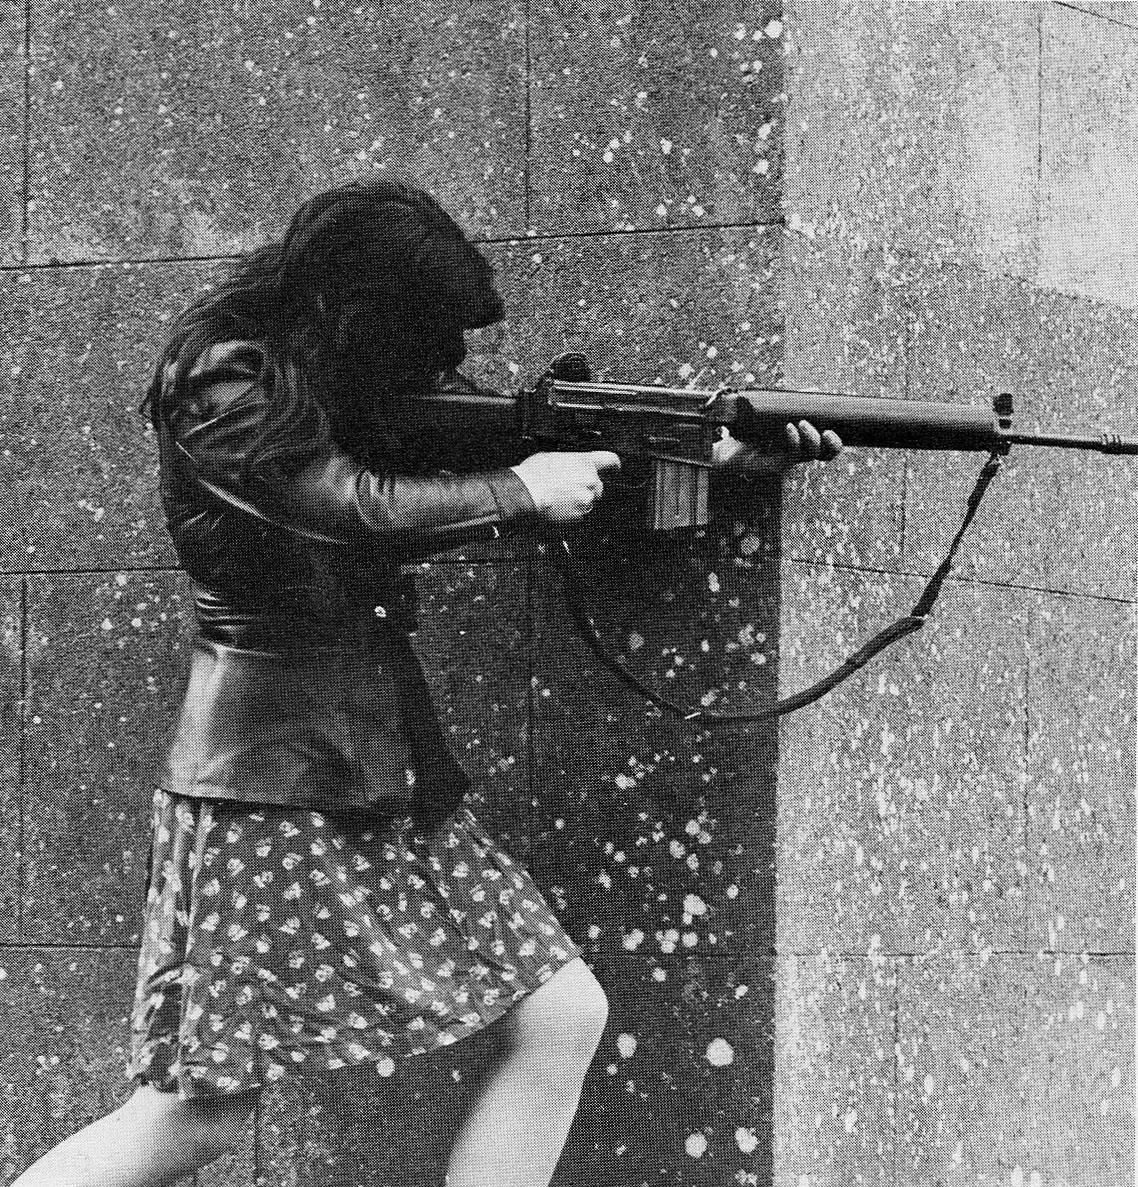 ArmaLite AR18 Rifles: Eugene Stoner's 'red-headed stepchild'…and we